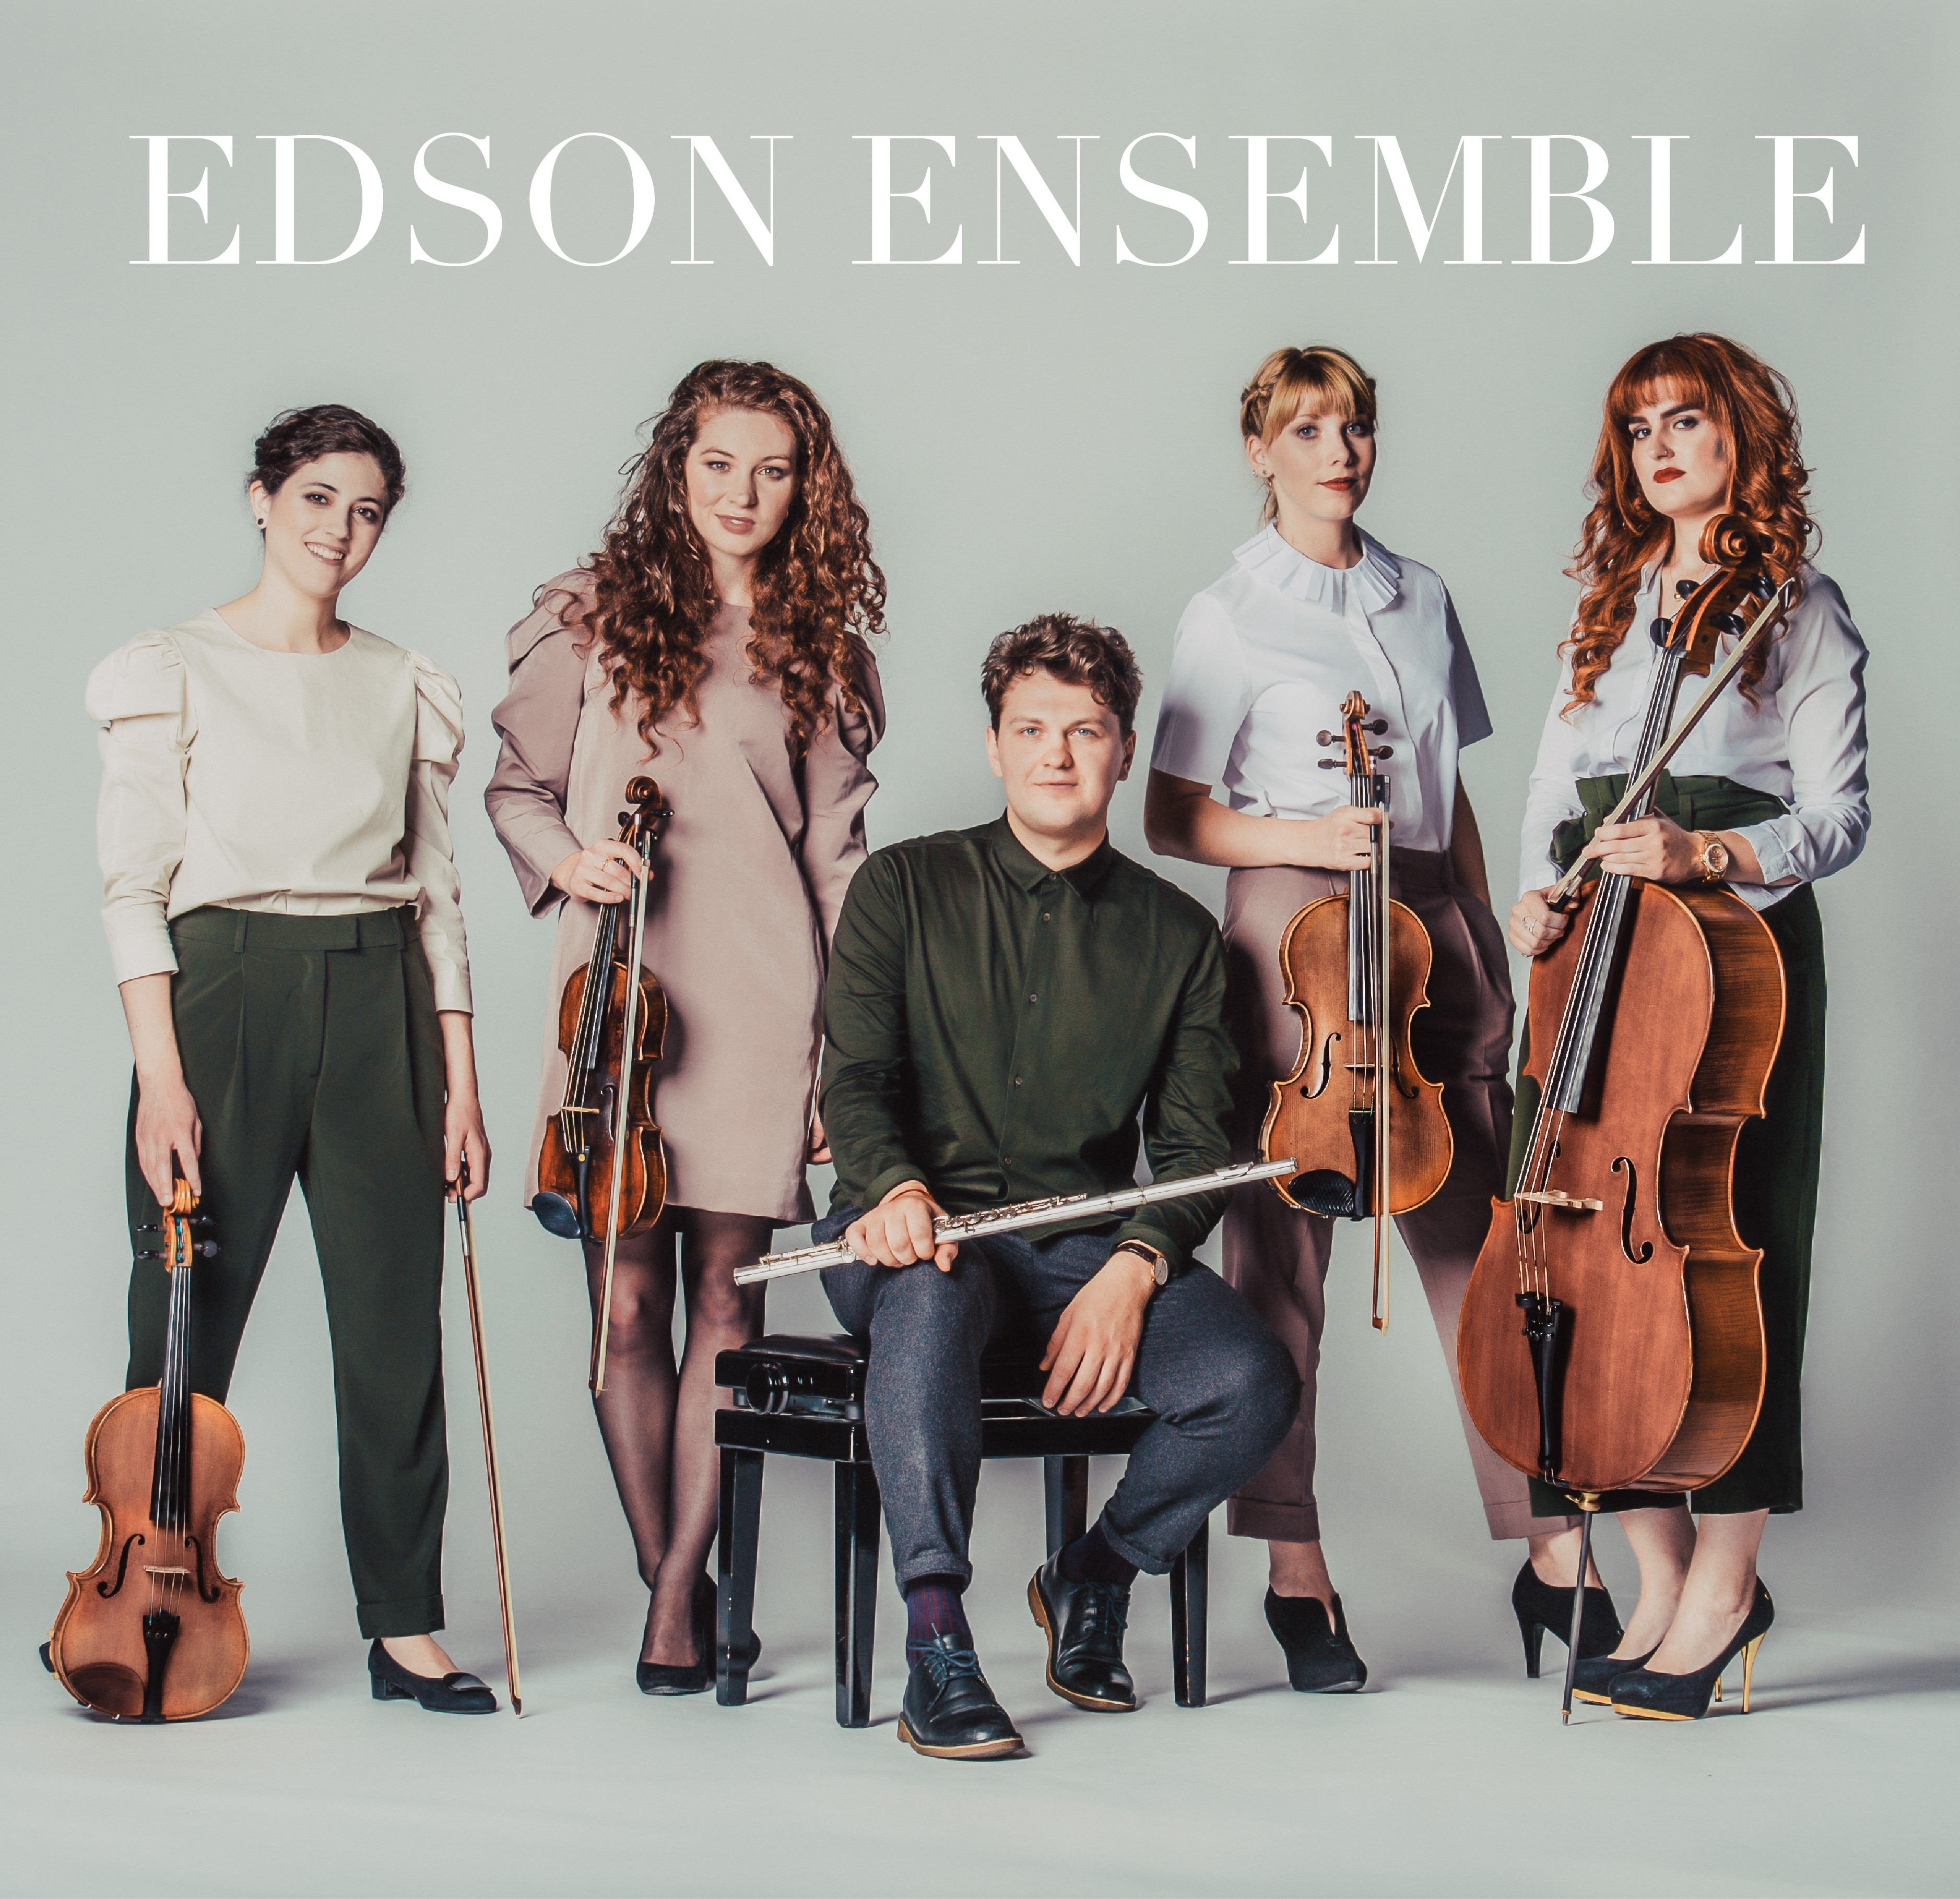 http://laisvadiena.lt/upload/101_-Edson-Ensemble-koncertas.jpg